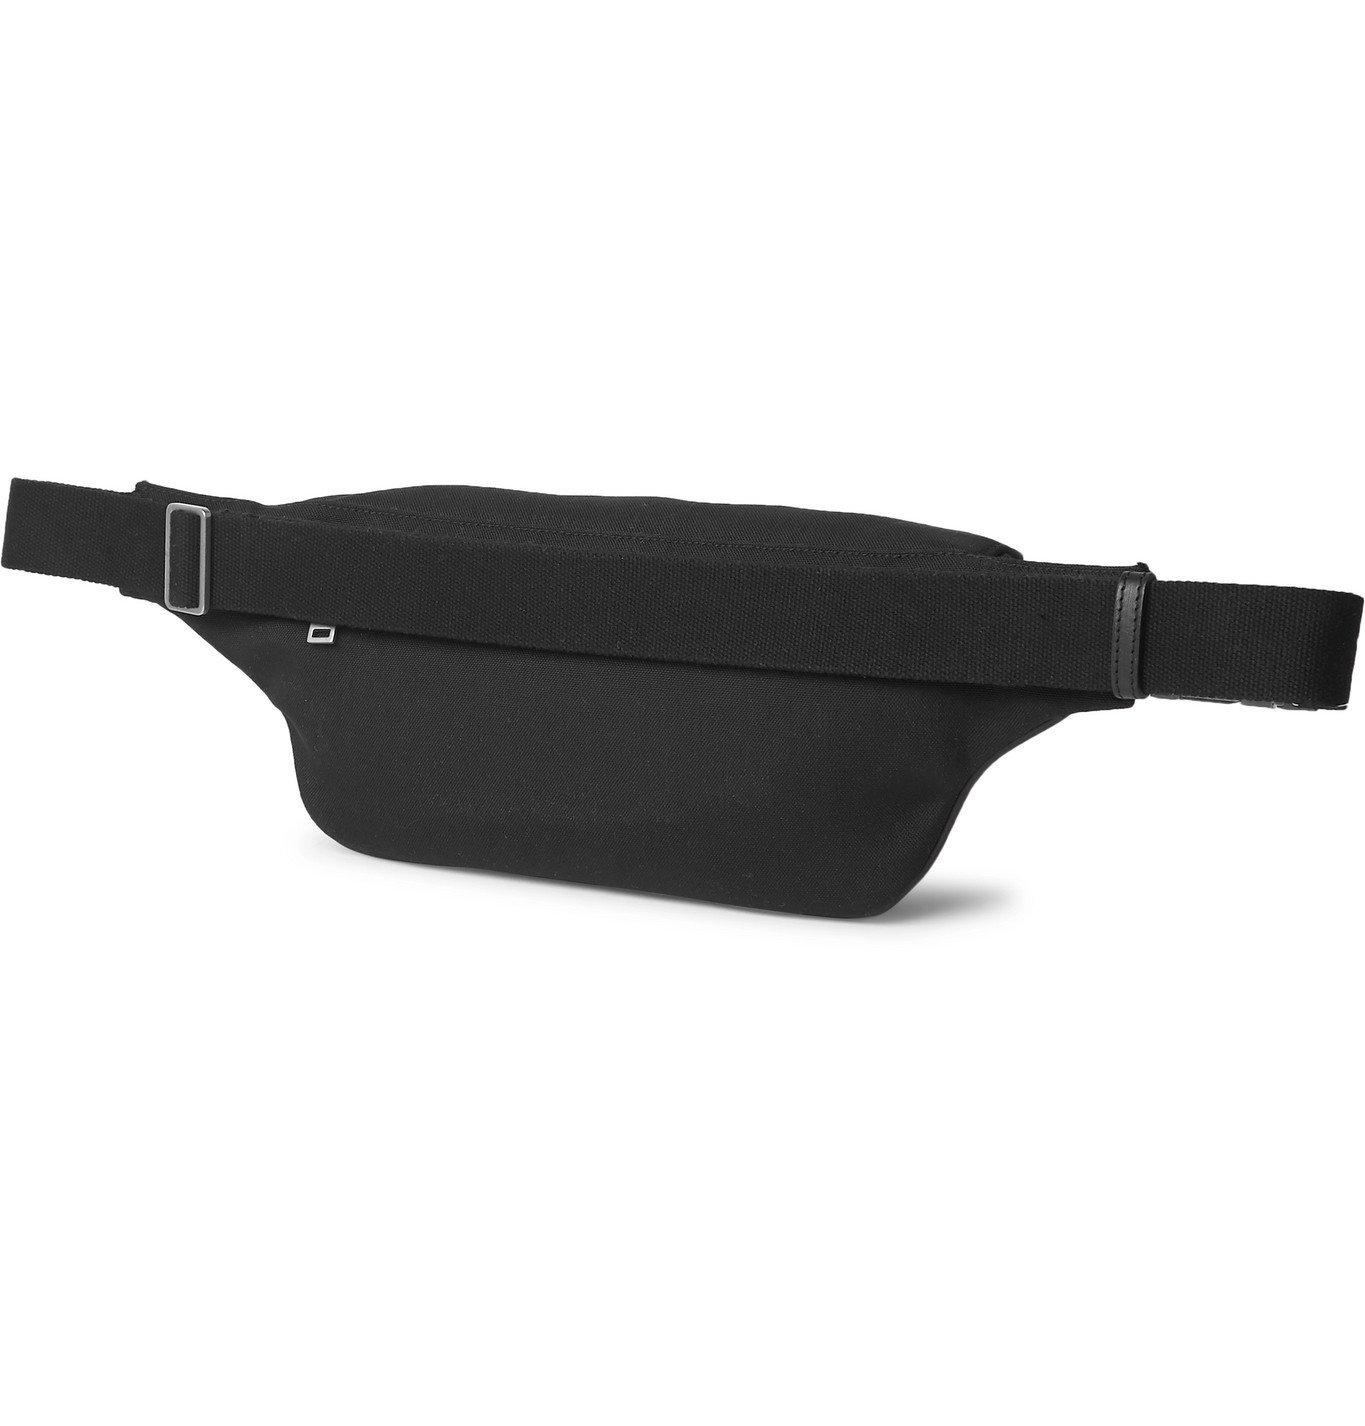 SAINT LAURENT - Leather-Trimmed Canvas Belt Bag - Black